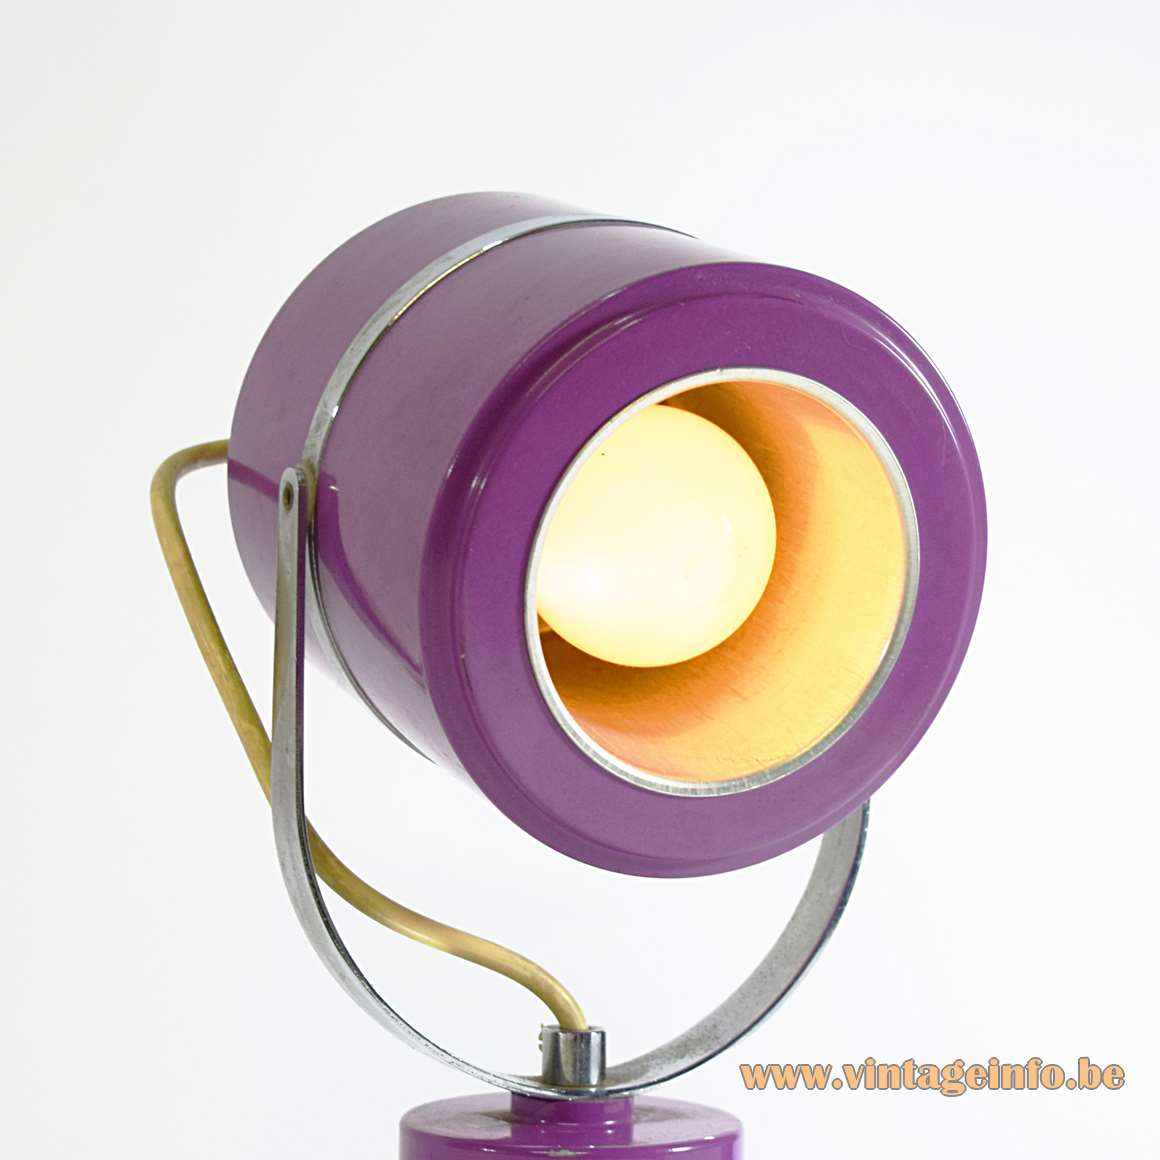 1970s Elma Table Lamp